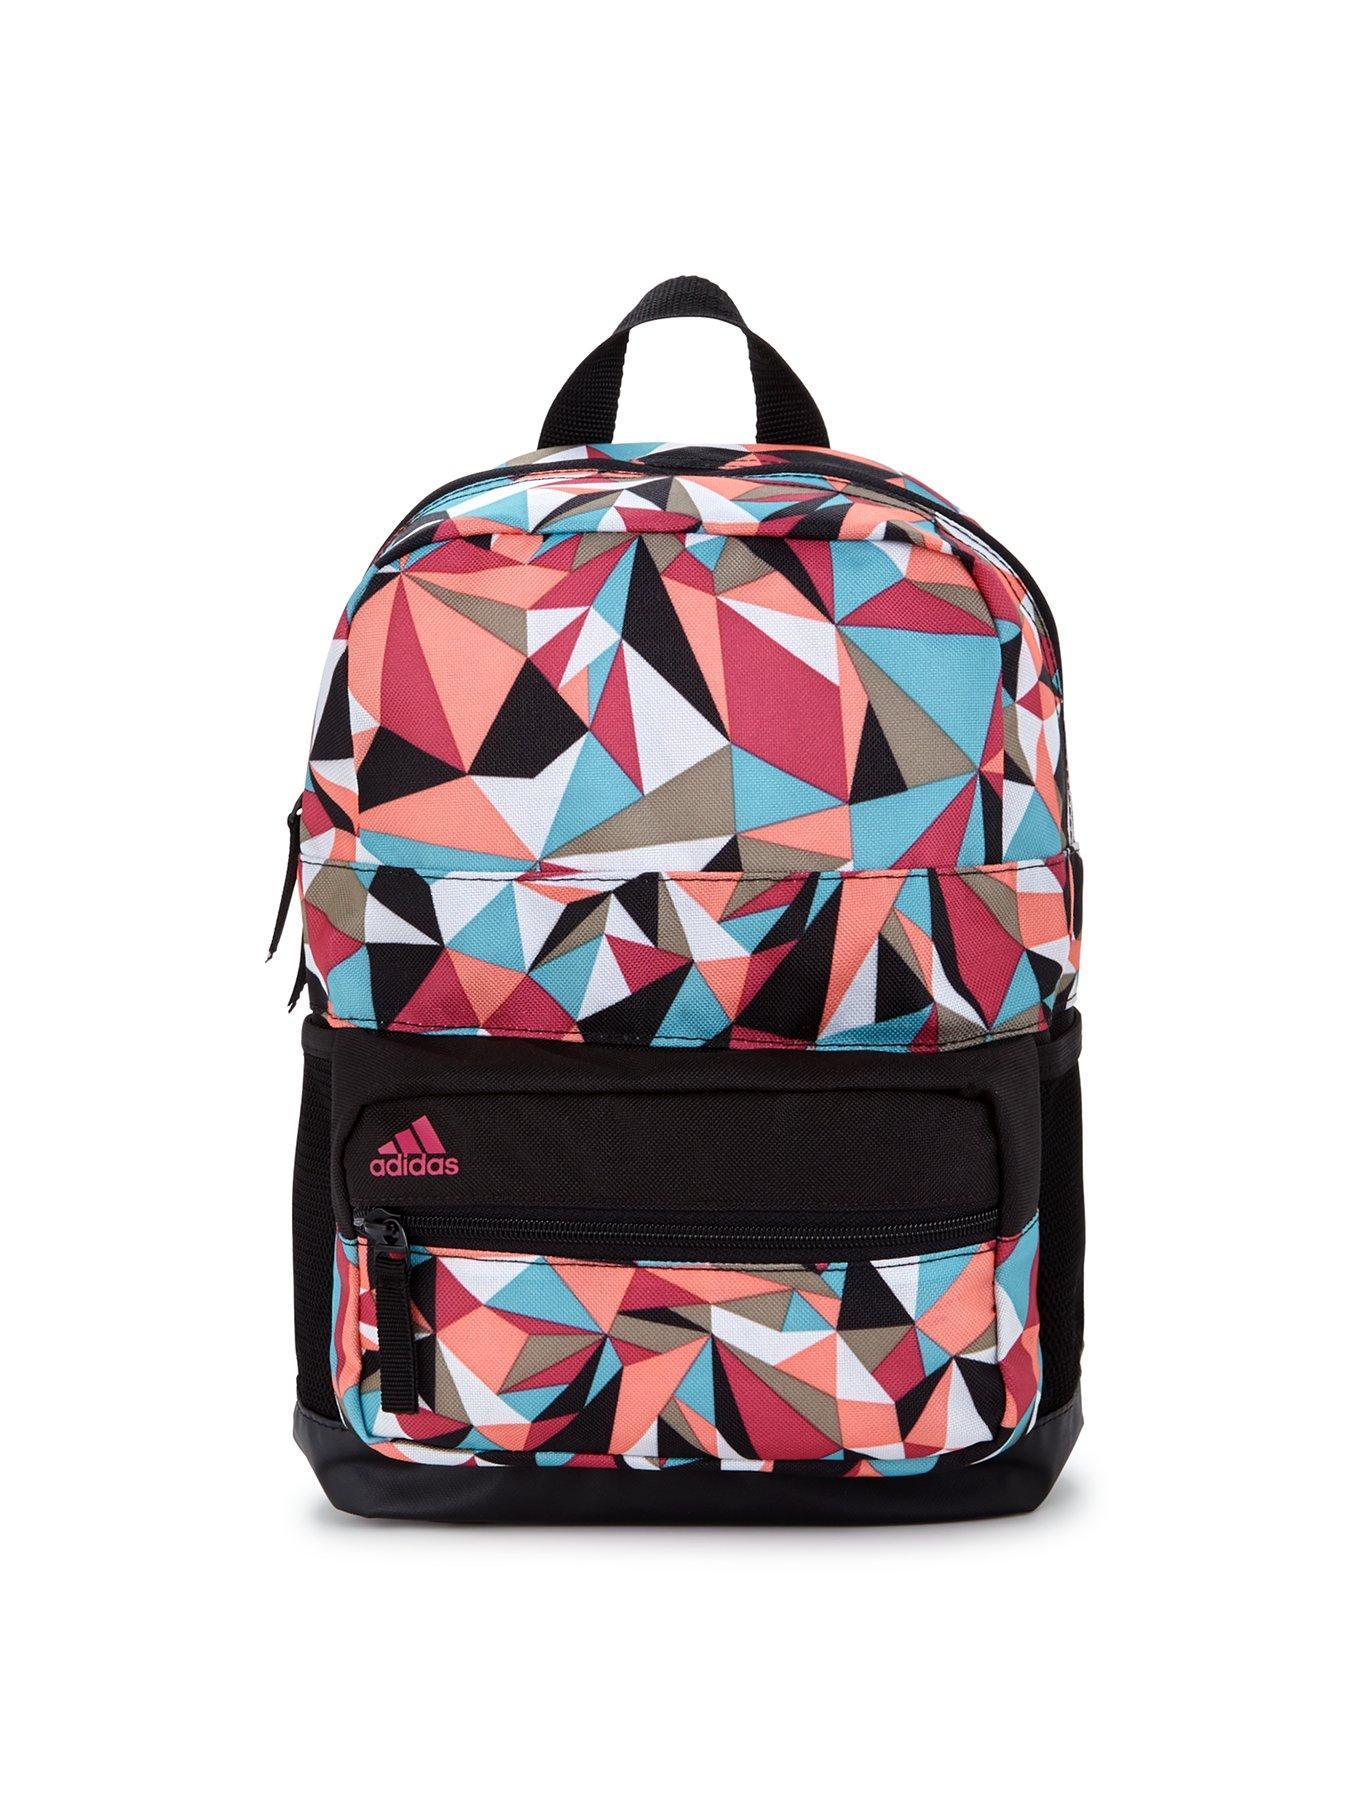 Under Armour Backpacks For Girls